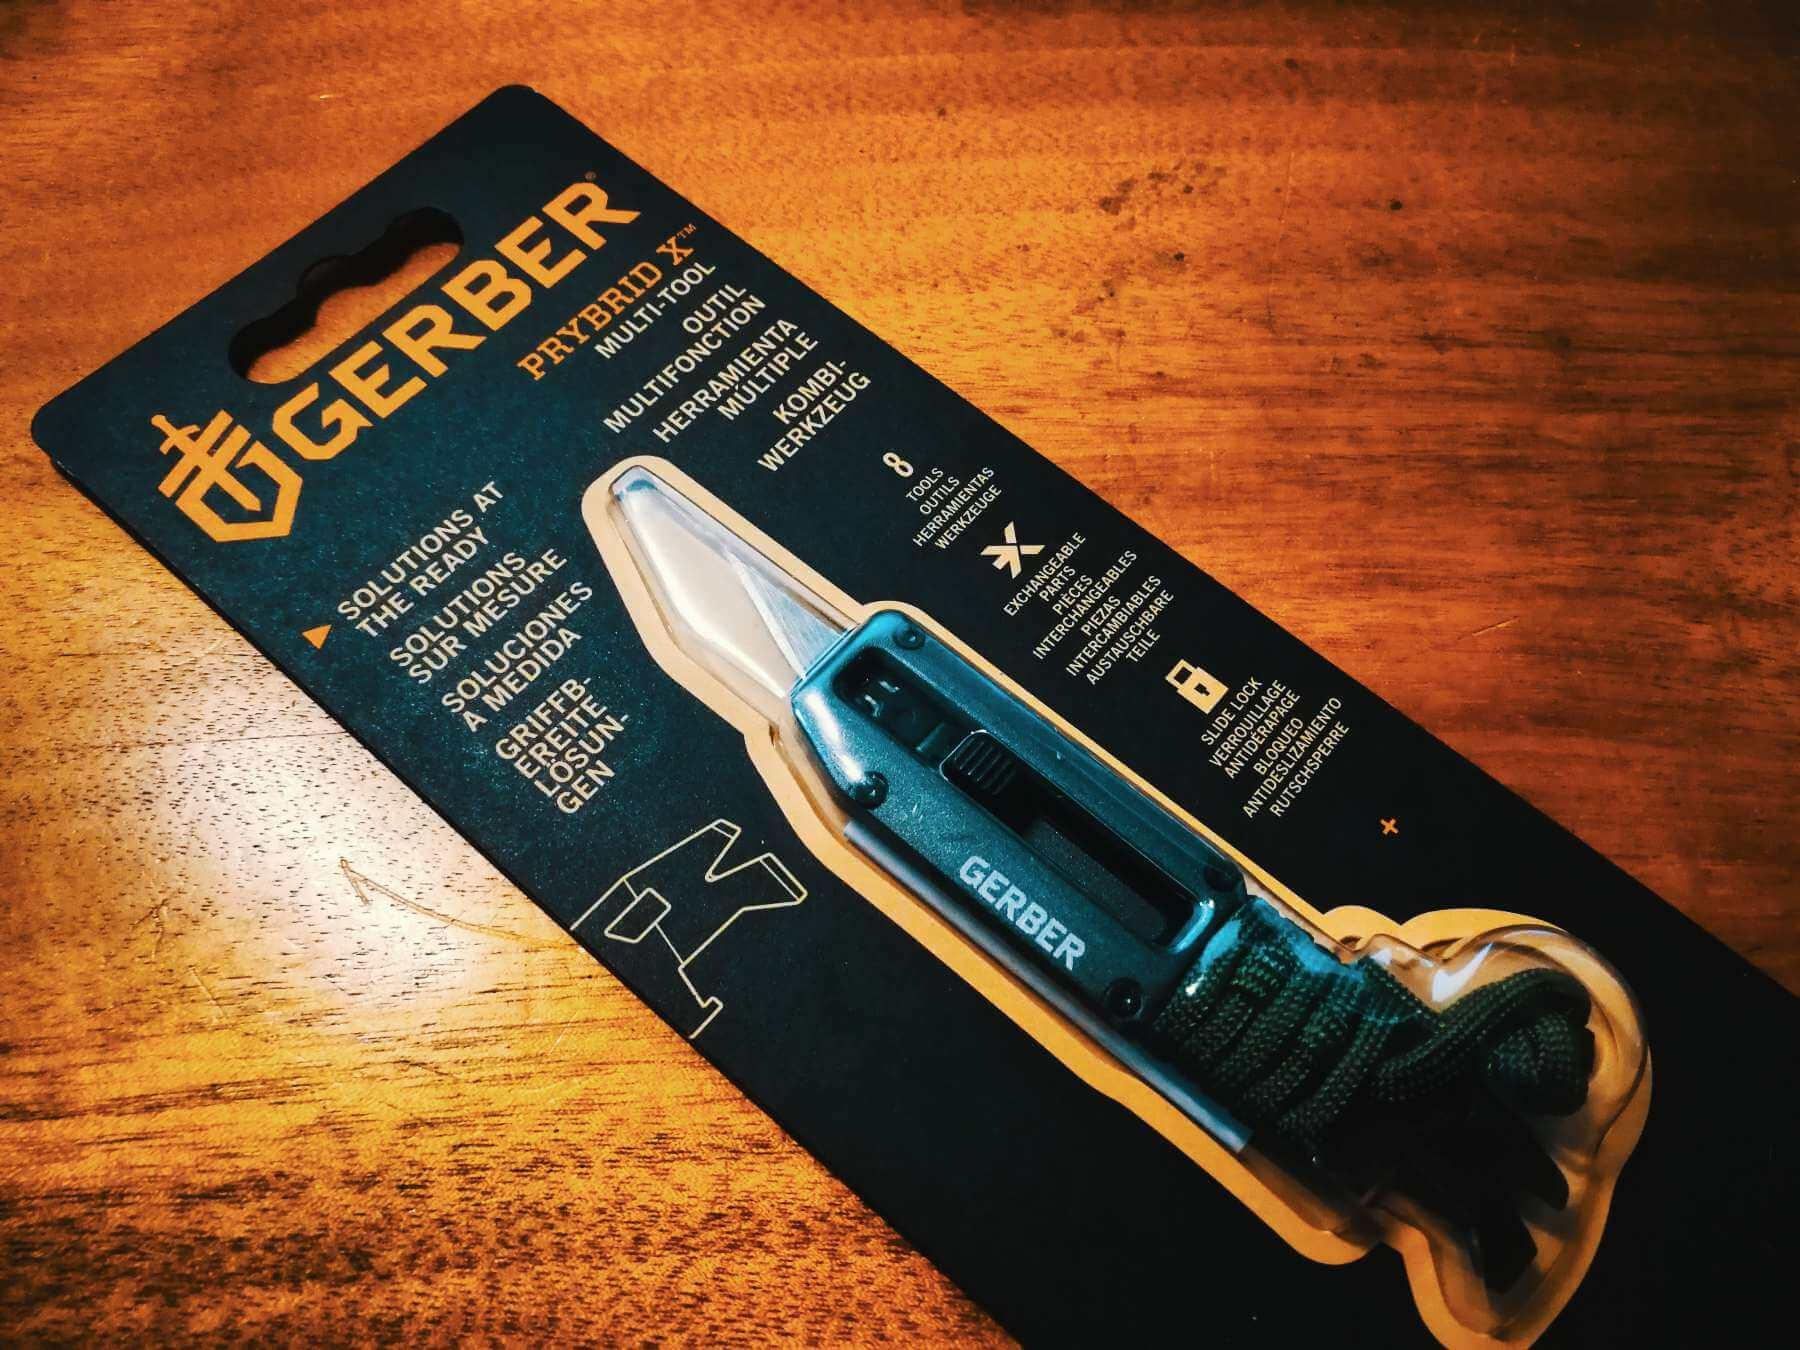 Gerber Prybrid X – Multi-Tool mit Skalpellklinge